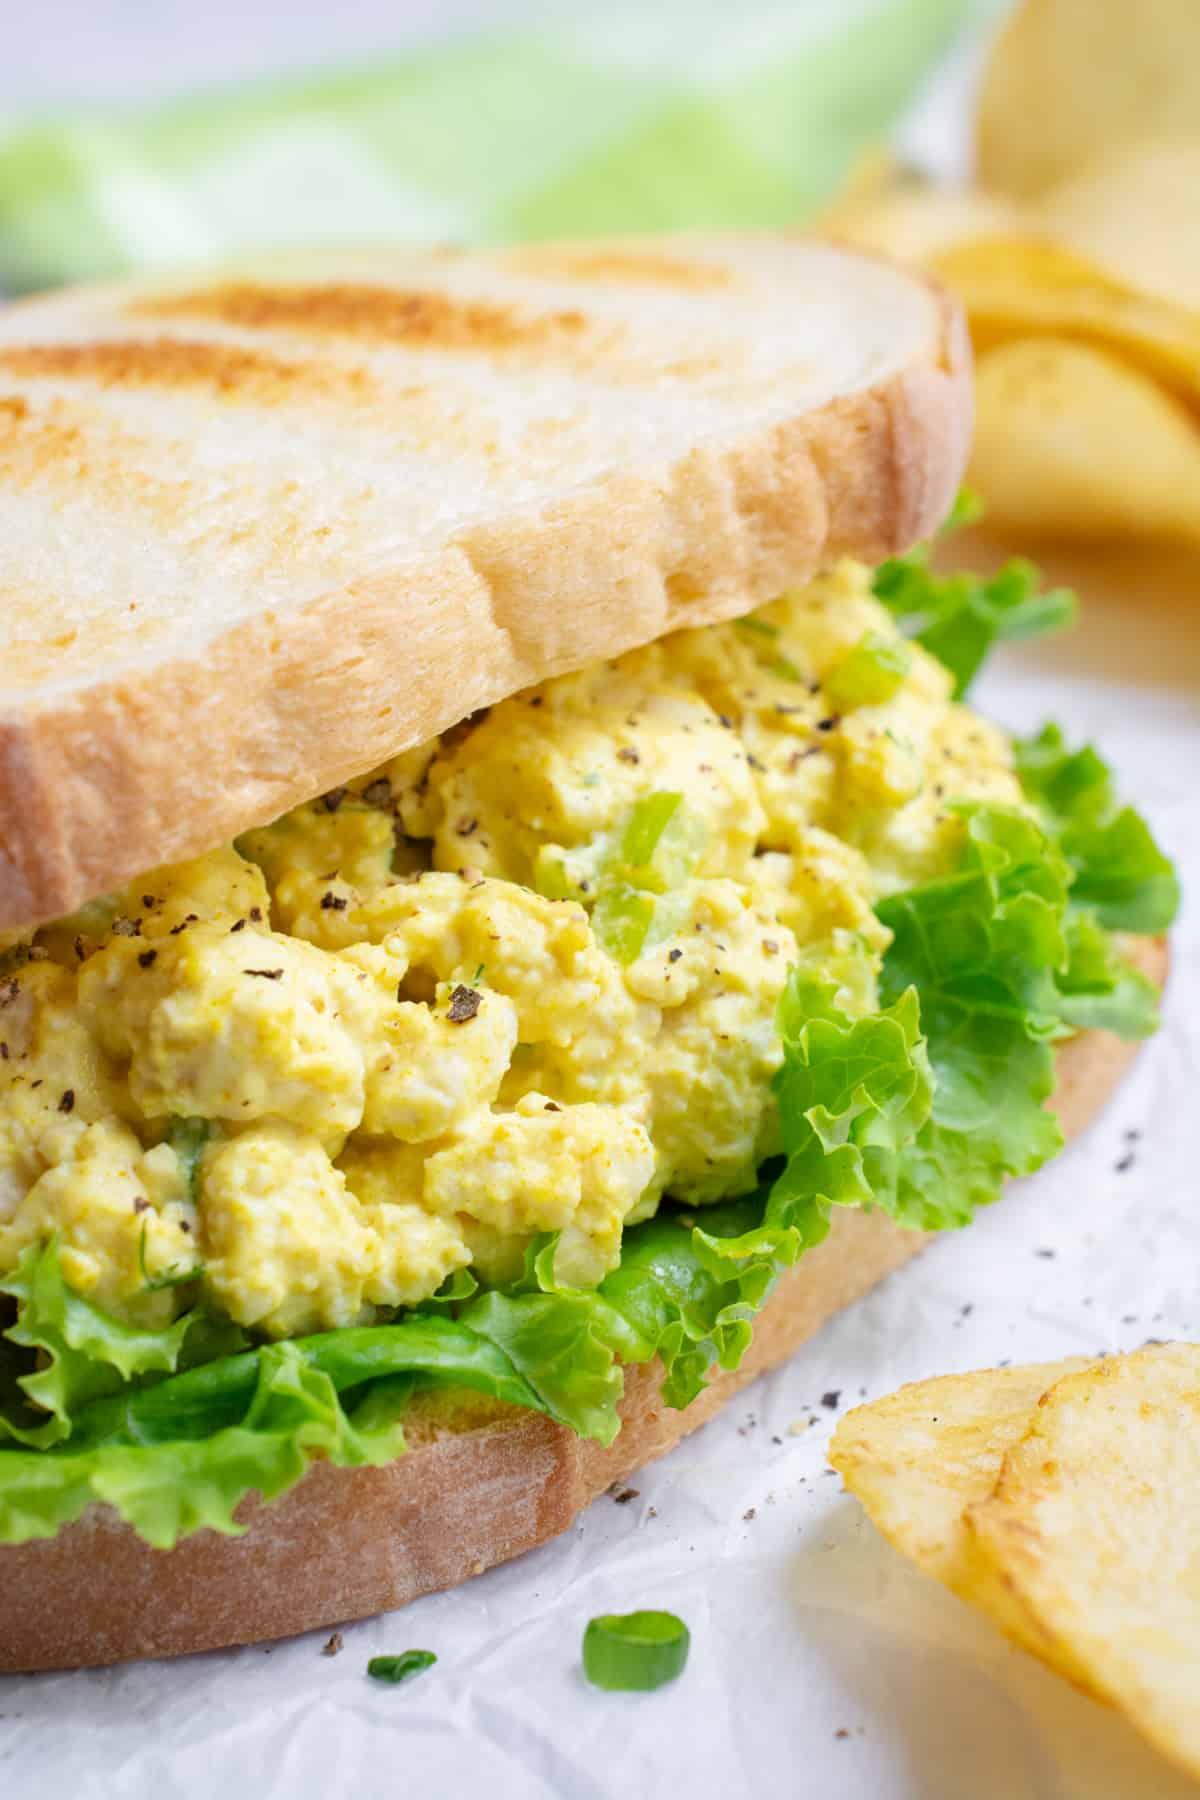 Vegan egg salad sandwich made with tofu.